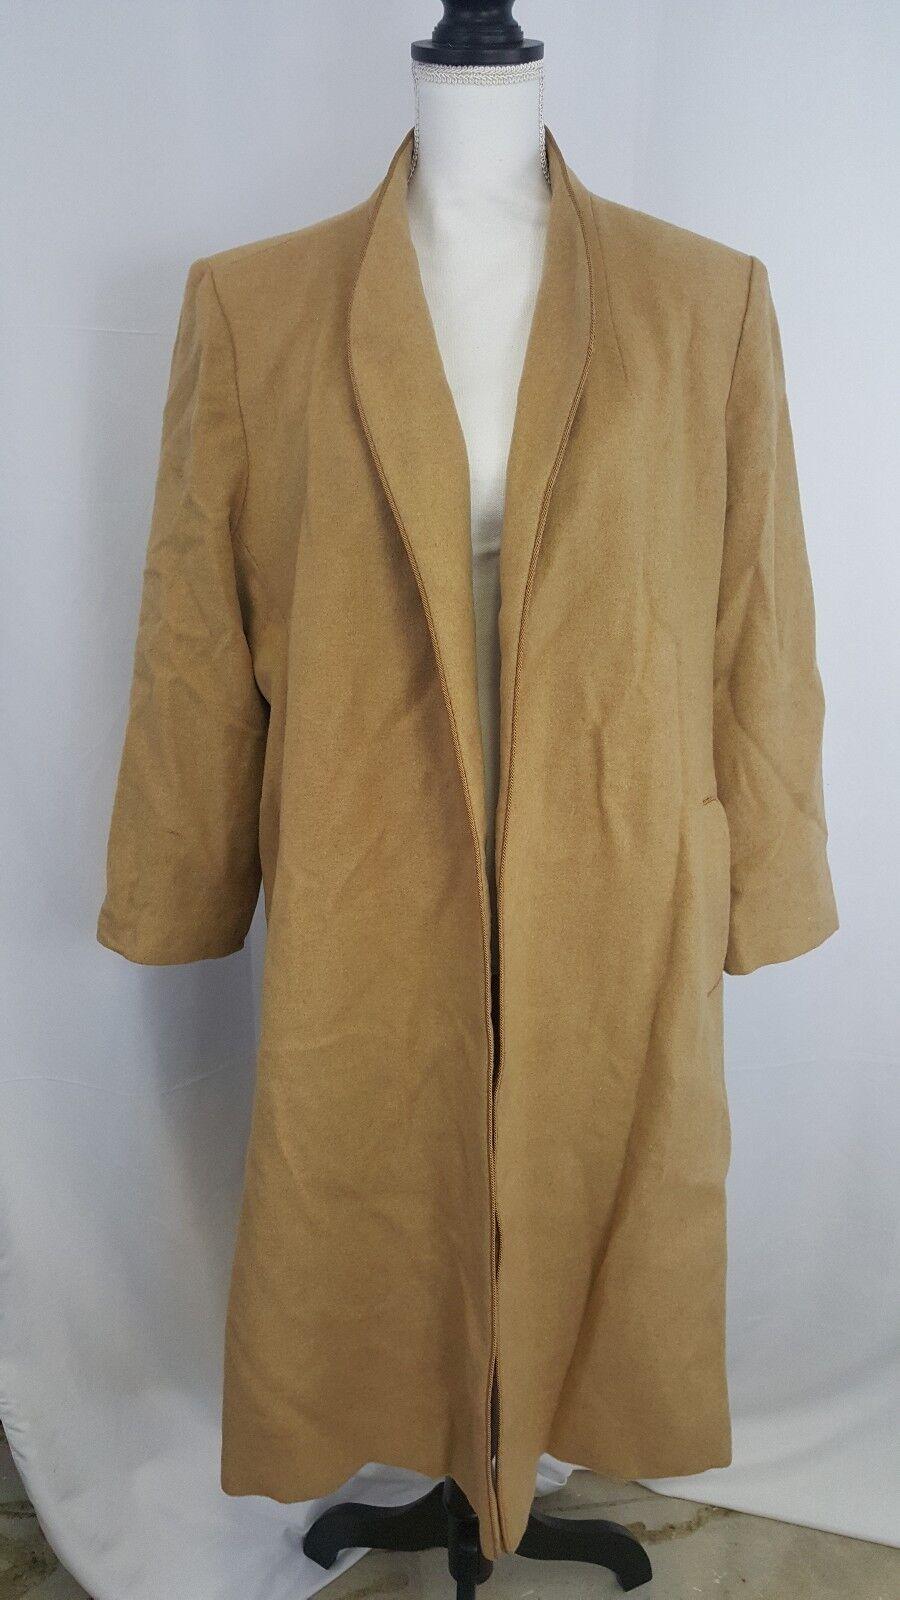 Vintage Flewrette of California 100% Camel Hair Lined Full Length Trench Coat M